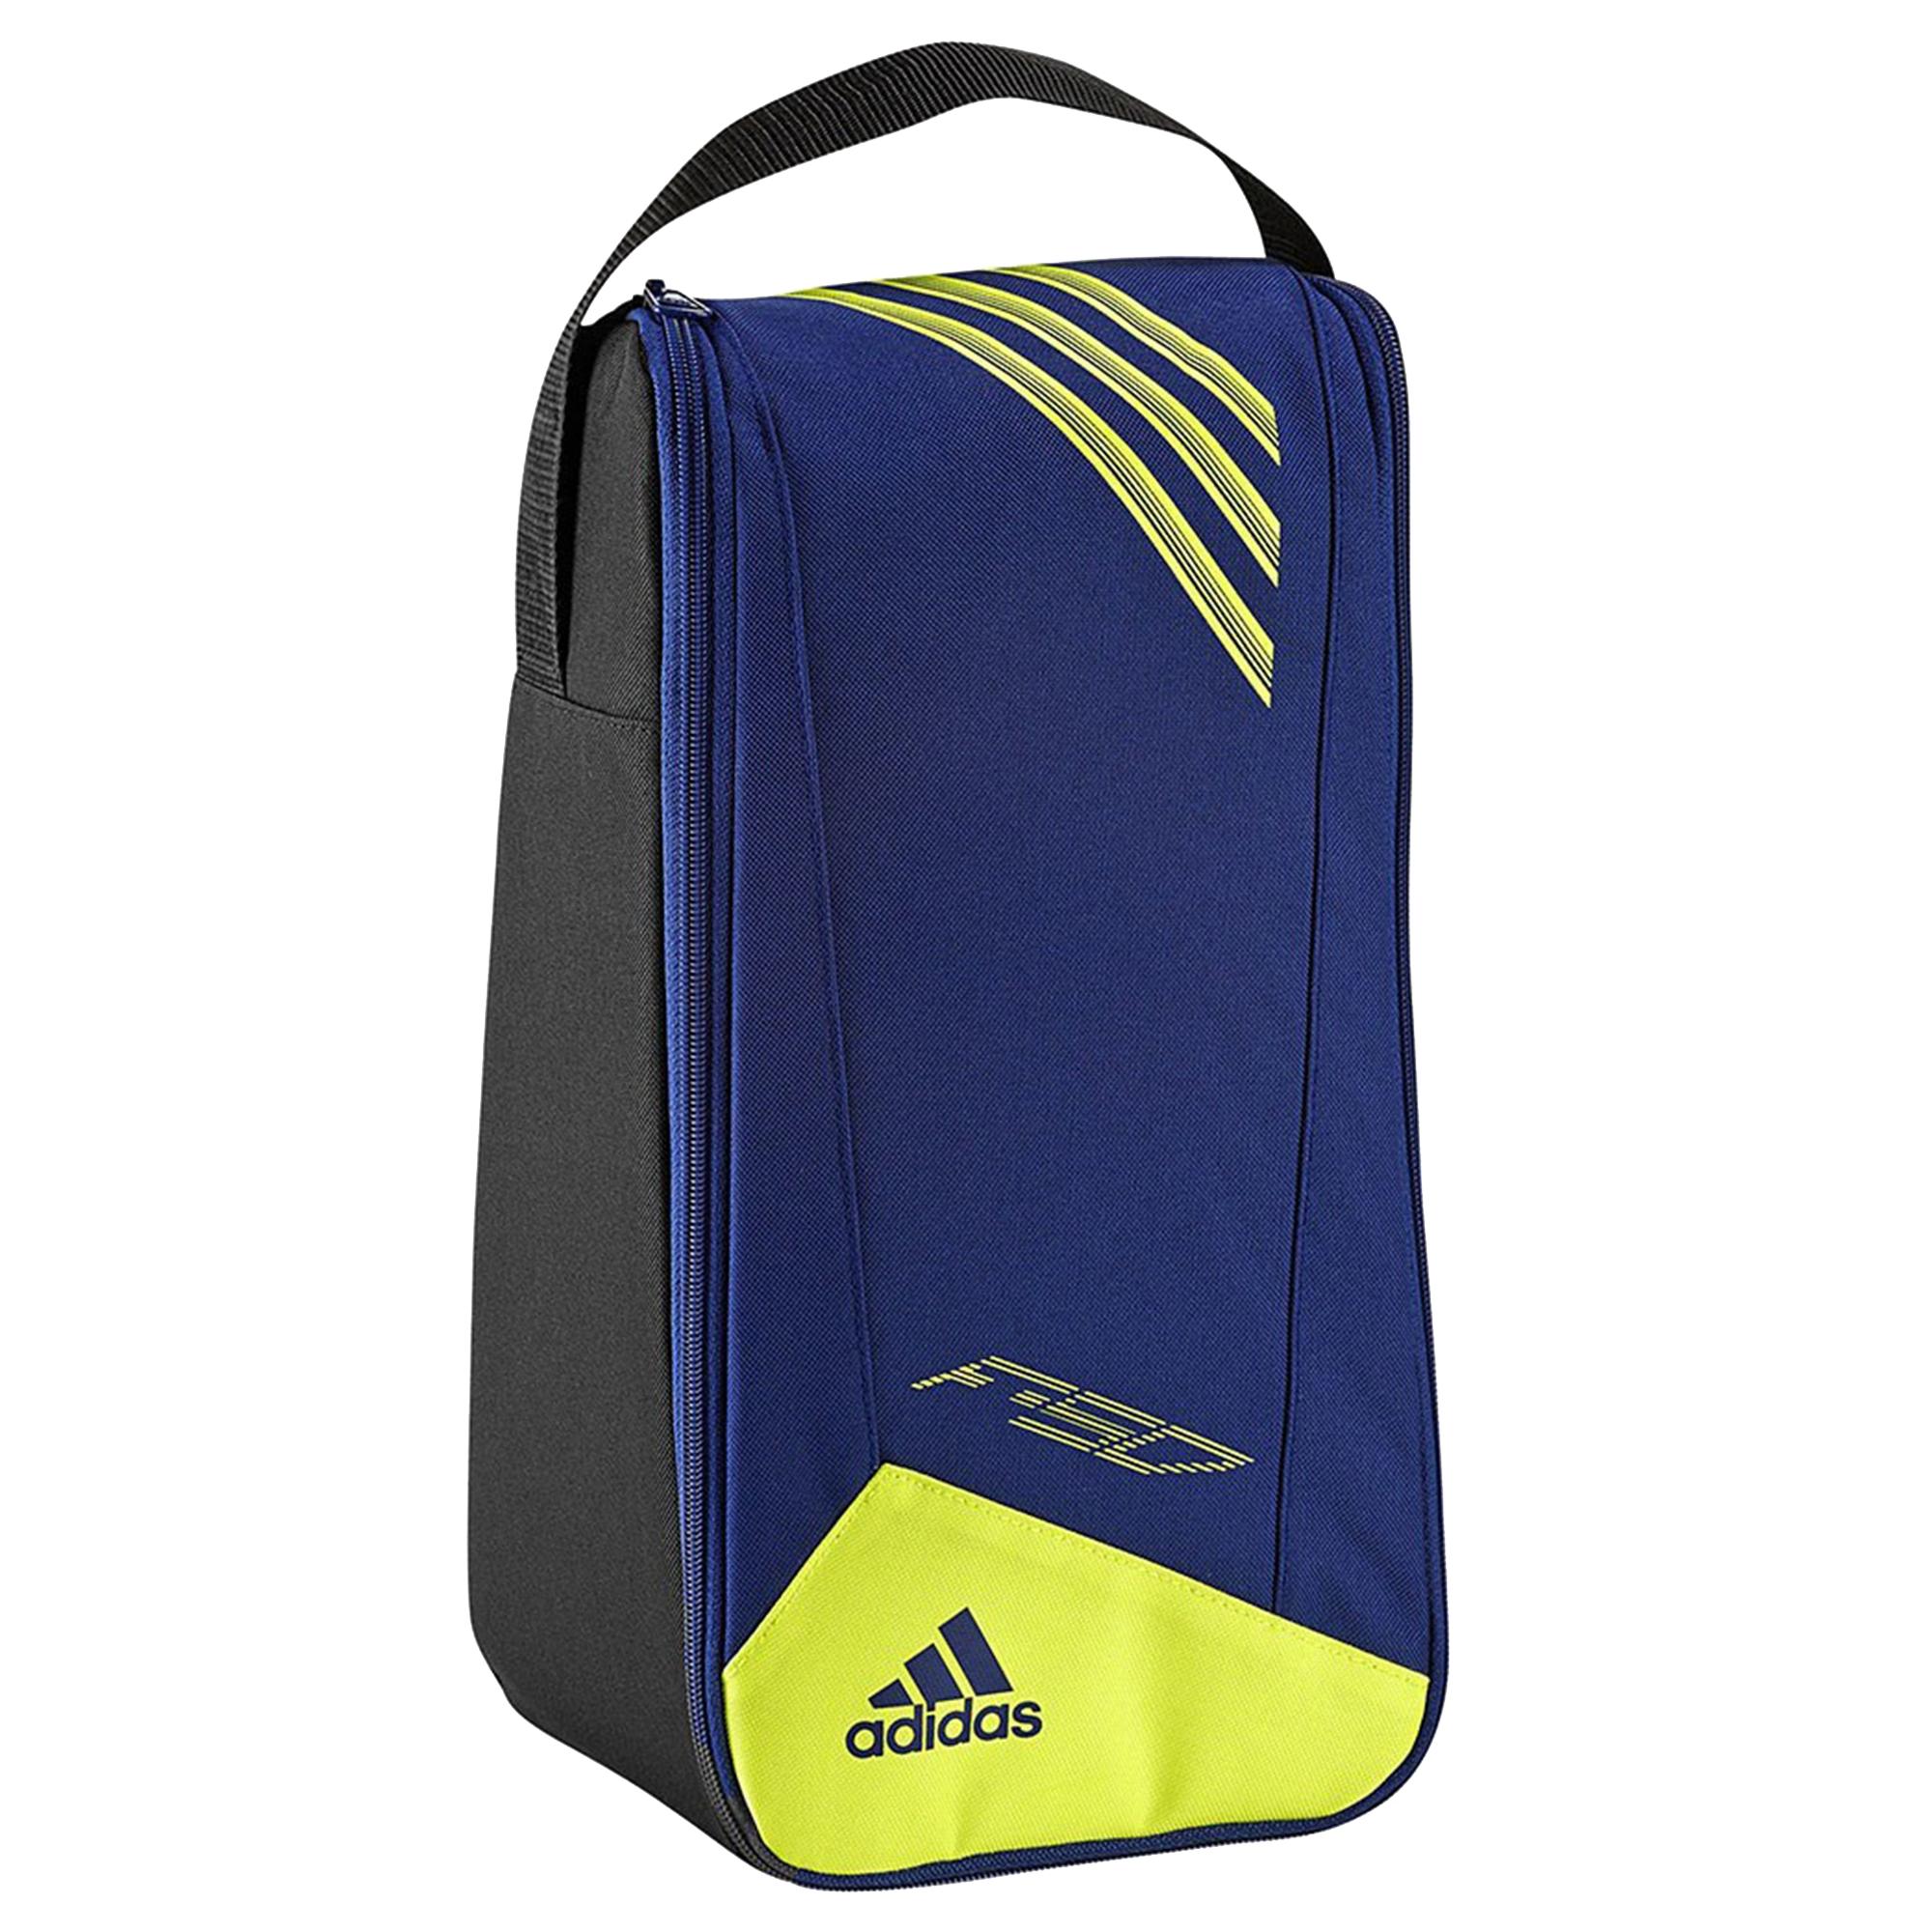 adidas F50 Shoe Bag Ayakkabı Çantası  G81675 - Barcin.com 8978d2734e61b